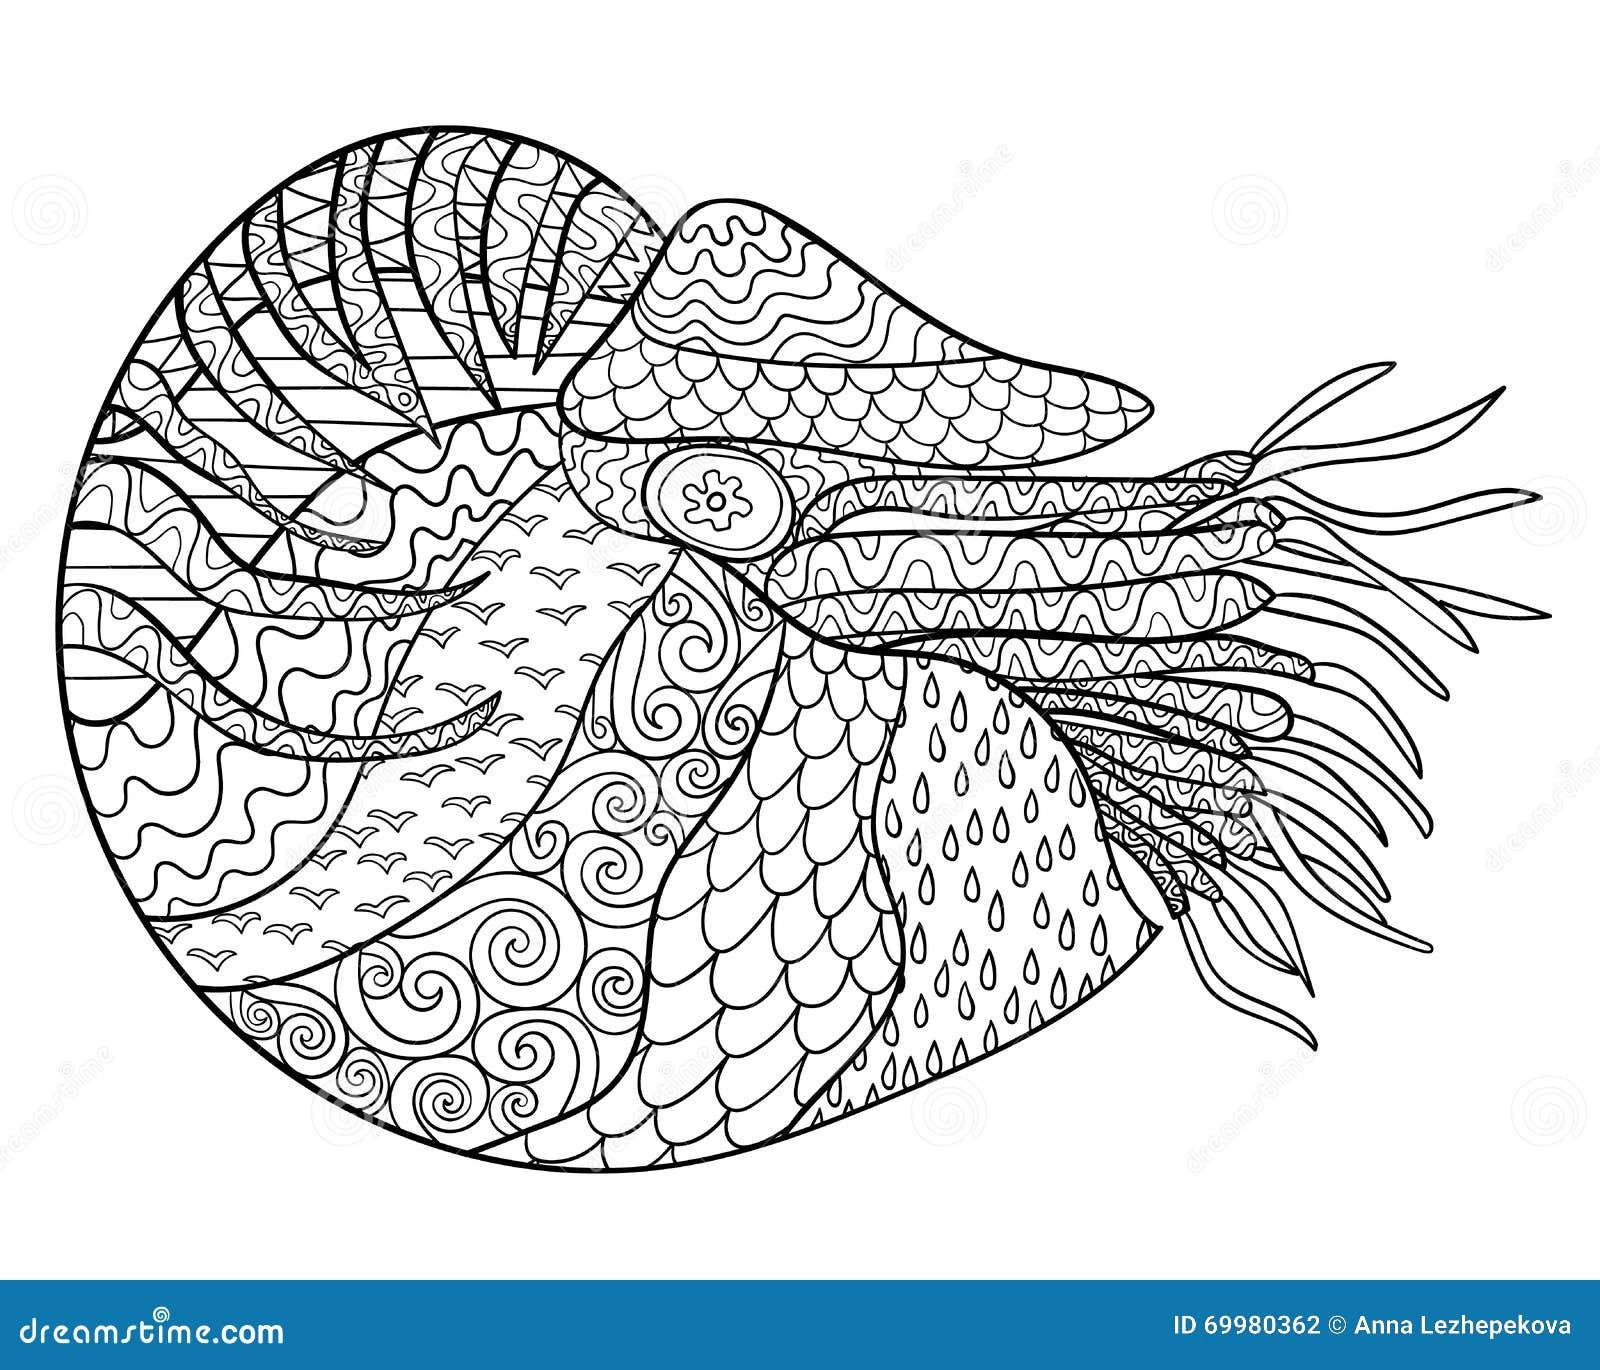 Line Art Nautilus : Nautilus with high details stock vector image